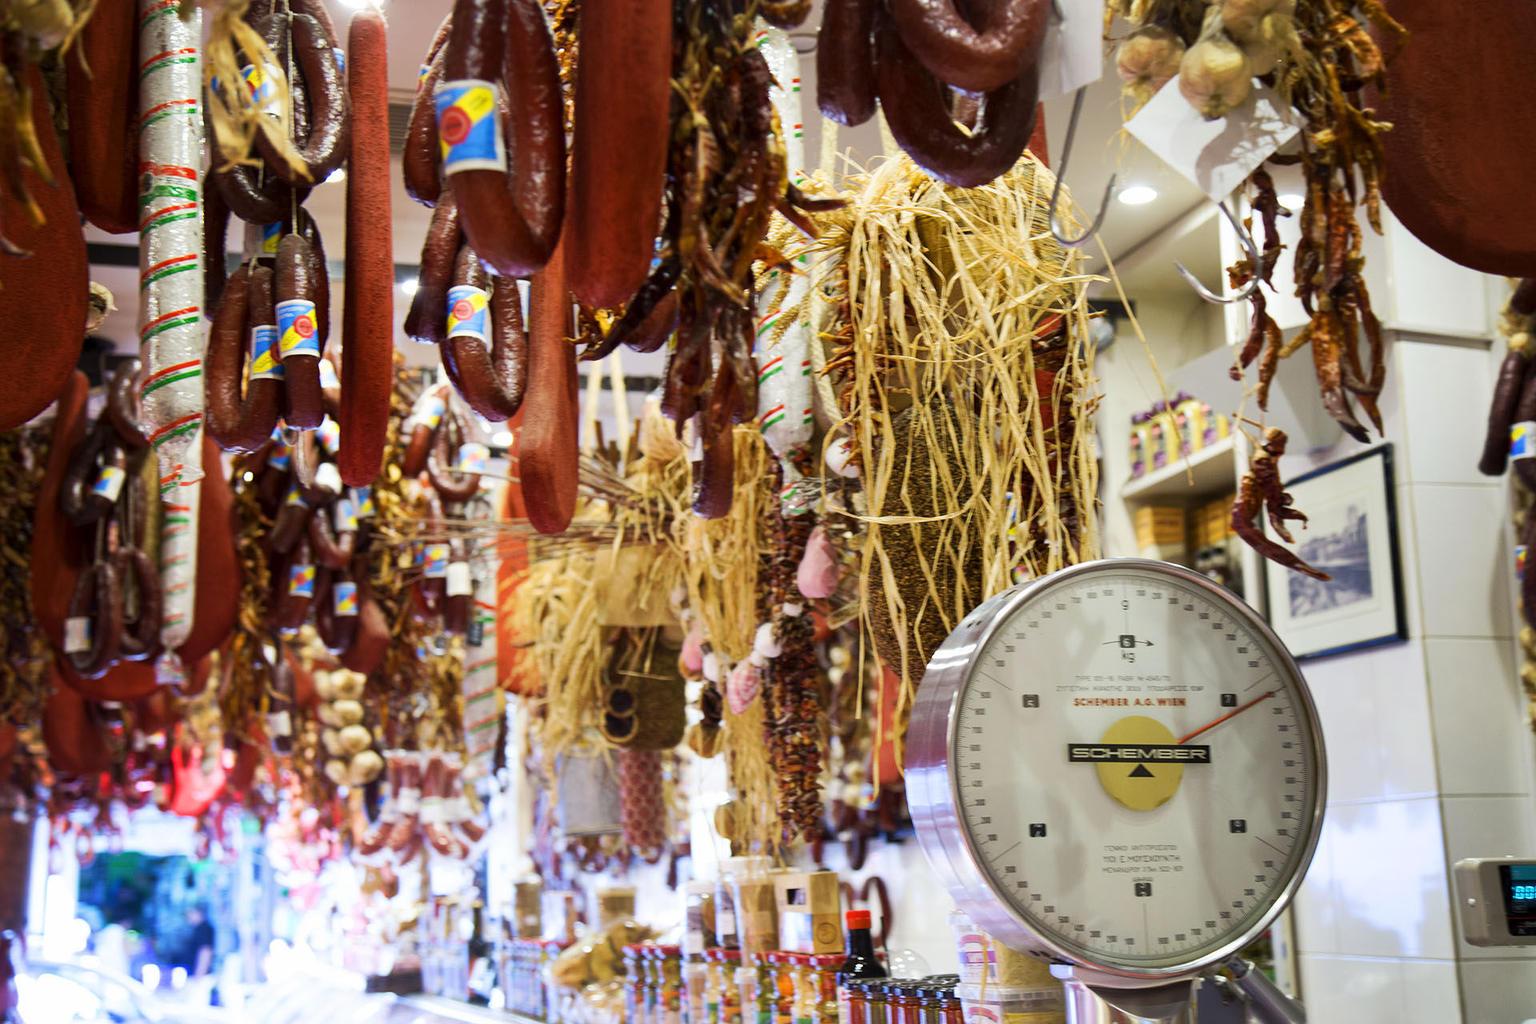 MÁS FOTOS, Small-Group Santorini Wine Tasting and Vineyard Tour